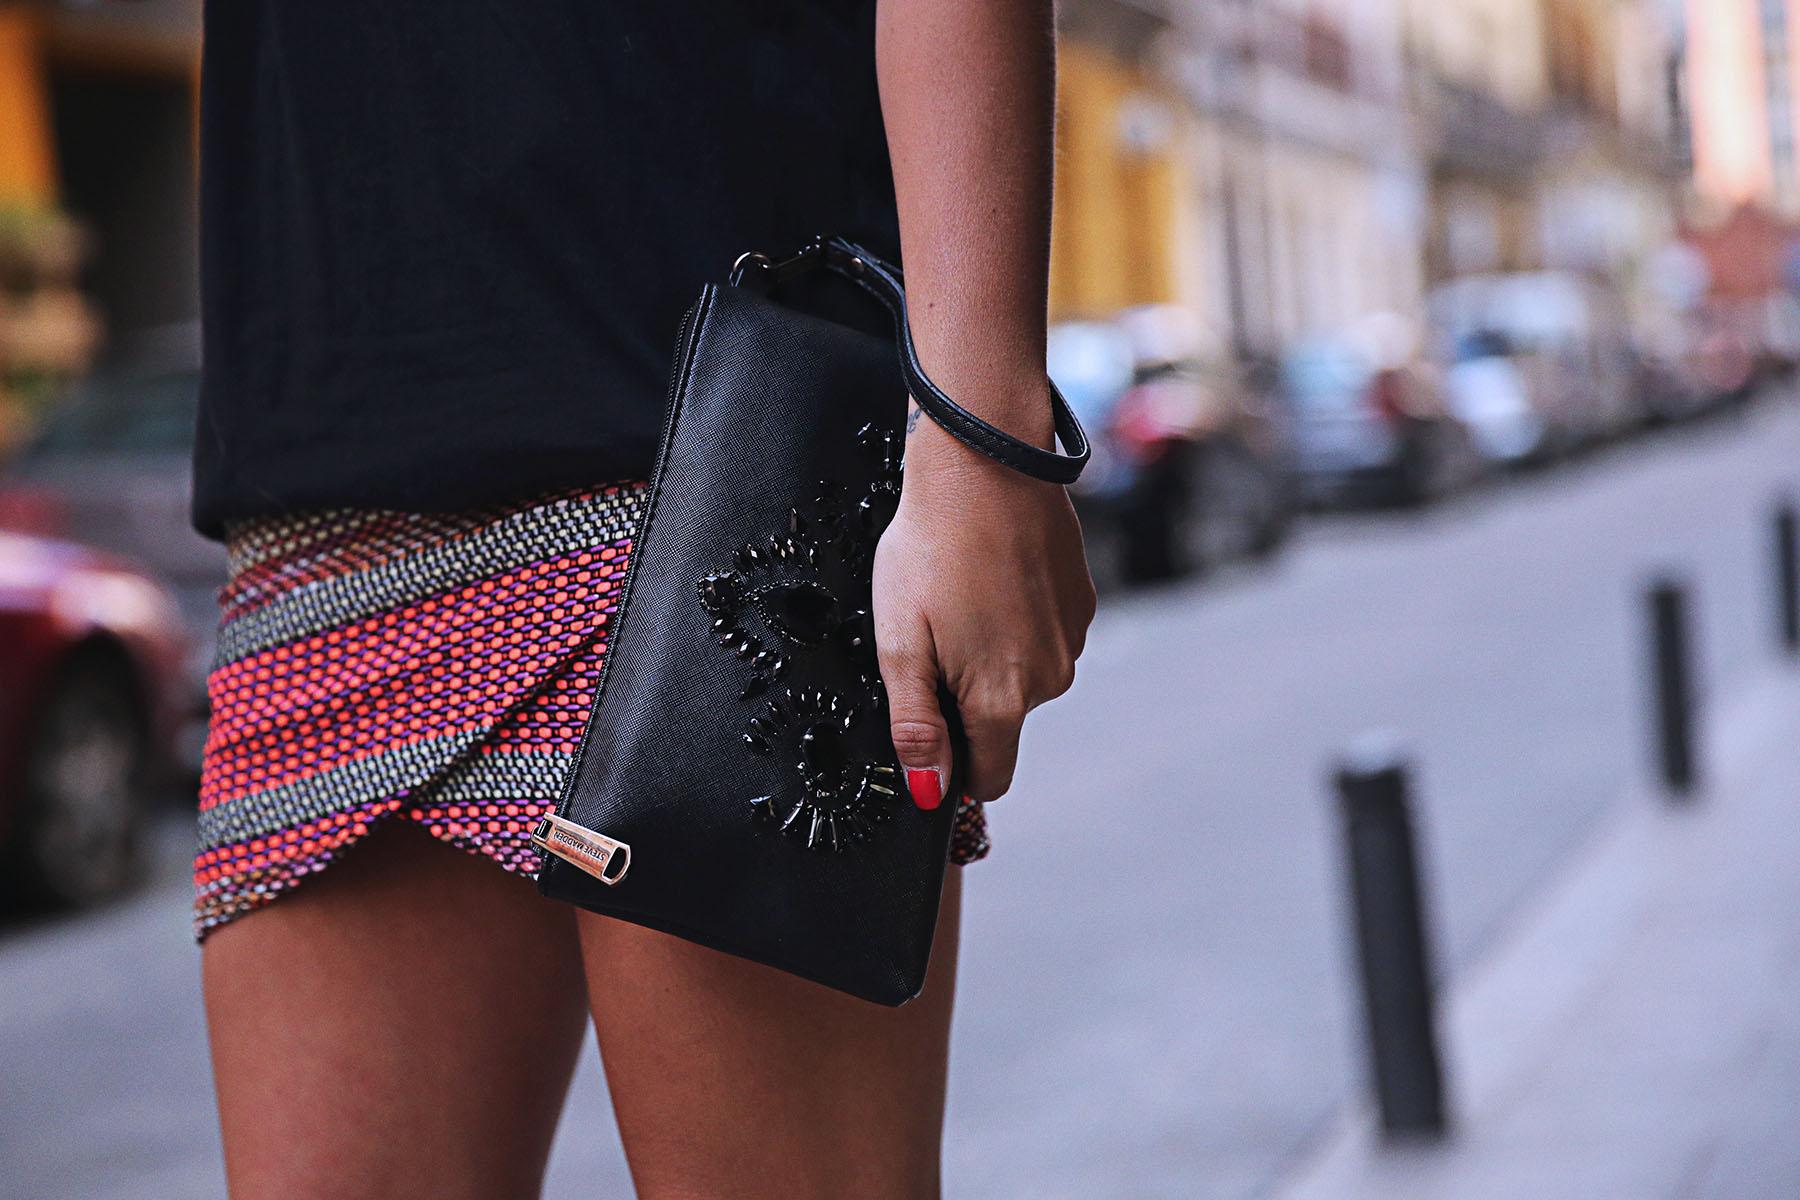 trendy-taste-look-outfit-street-style-ootd-blog-blogger-fashion-spain-moda-españa-falda-etnica-ethnic-print-skirt-steve-madden-basic-tee-dior-black-negro-1